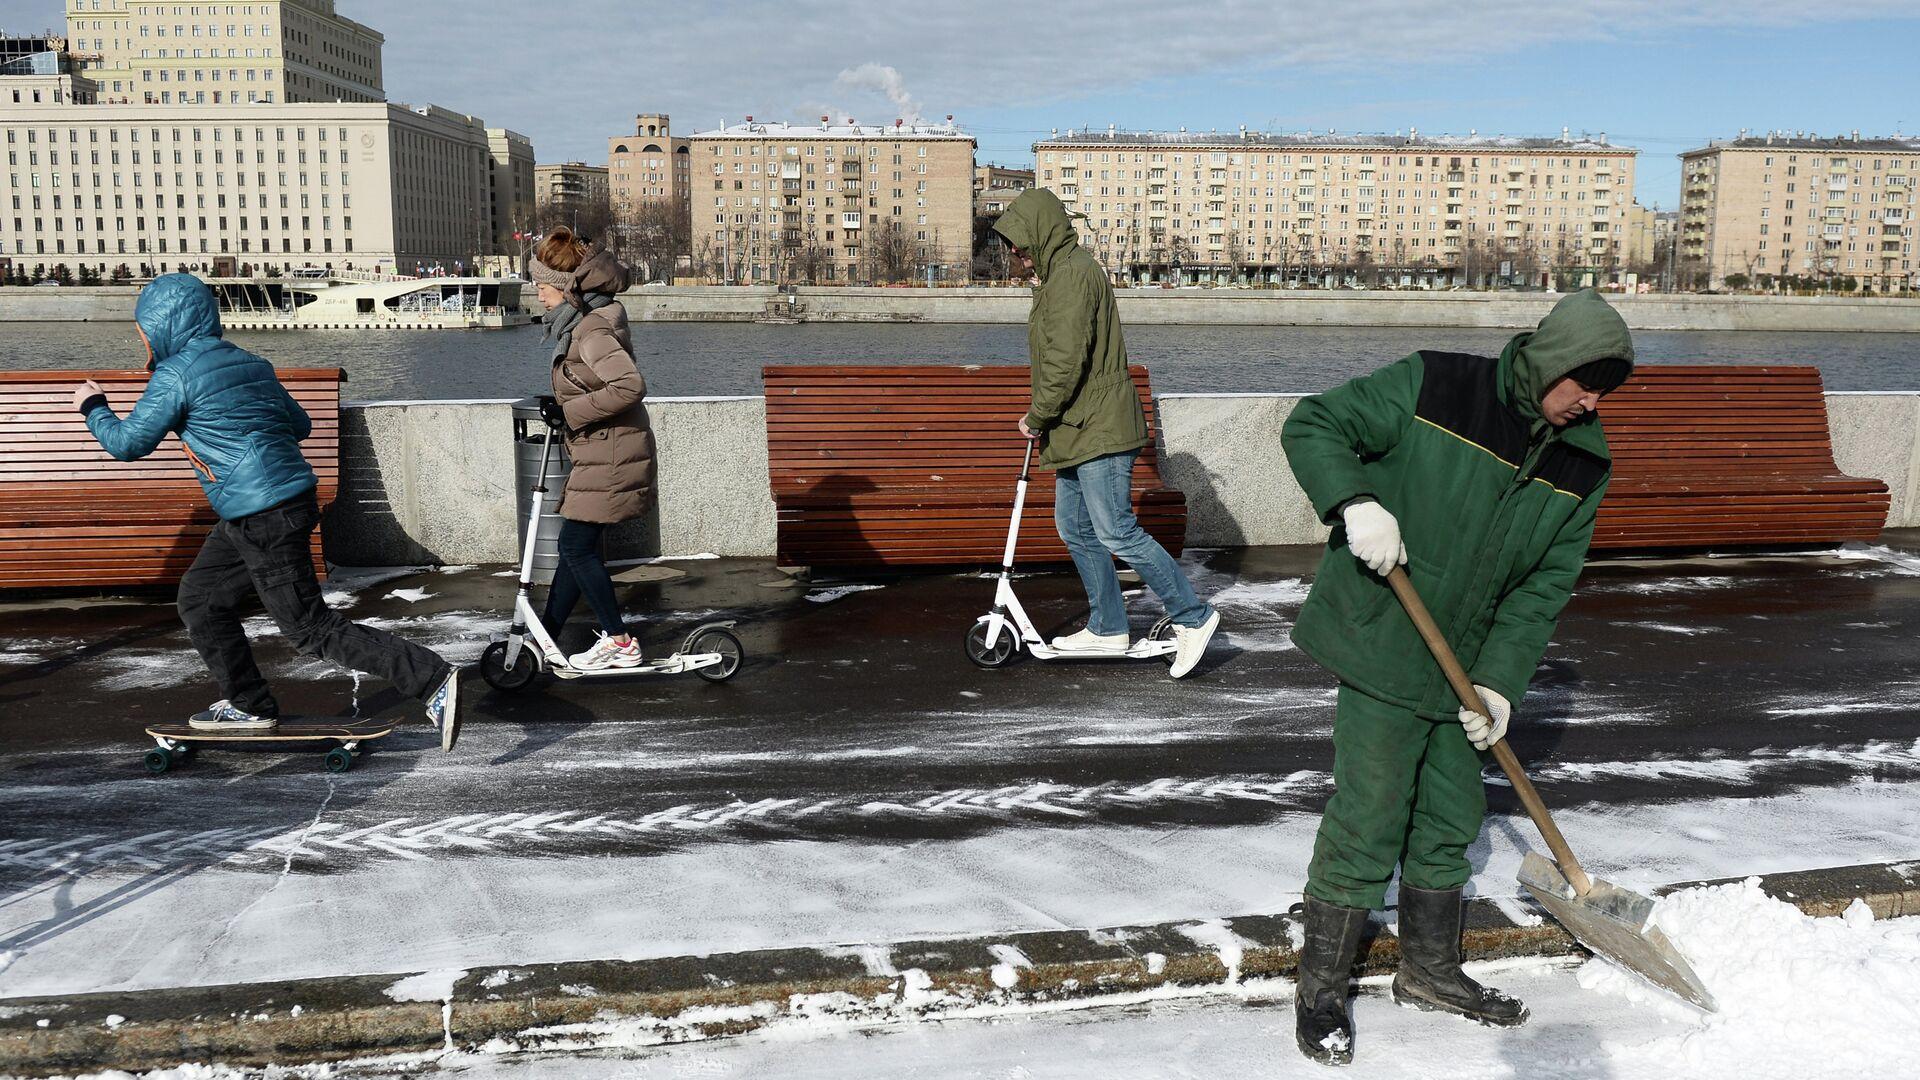 Сотрудник служб ЖКХ убирает снег - РИА Новости, 1920, 15.03.2021